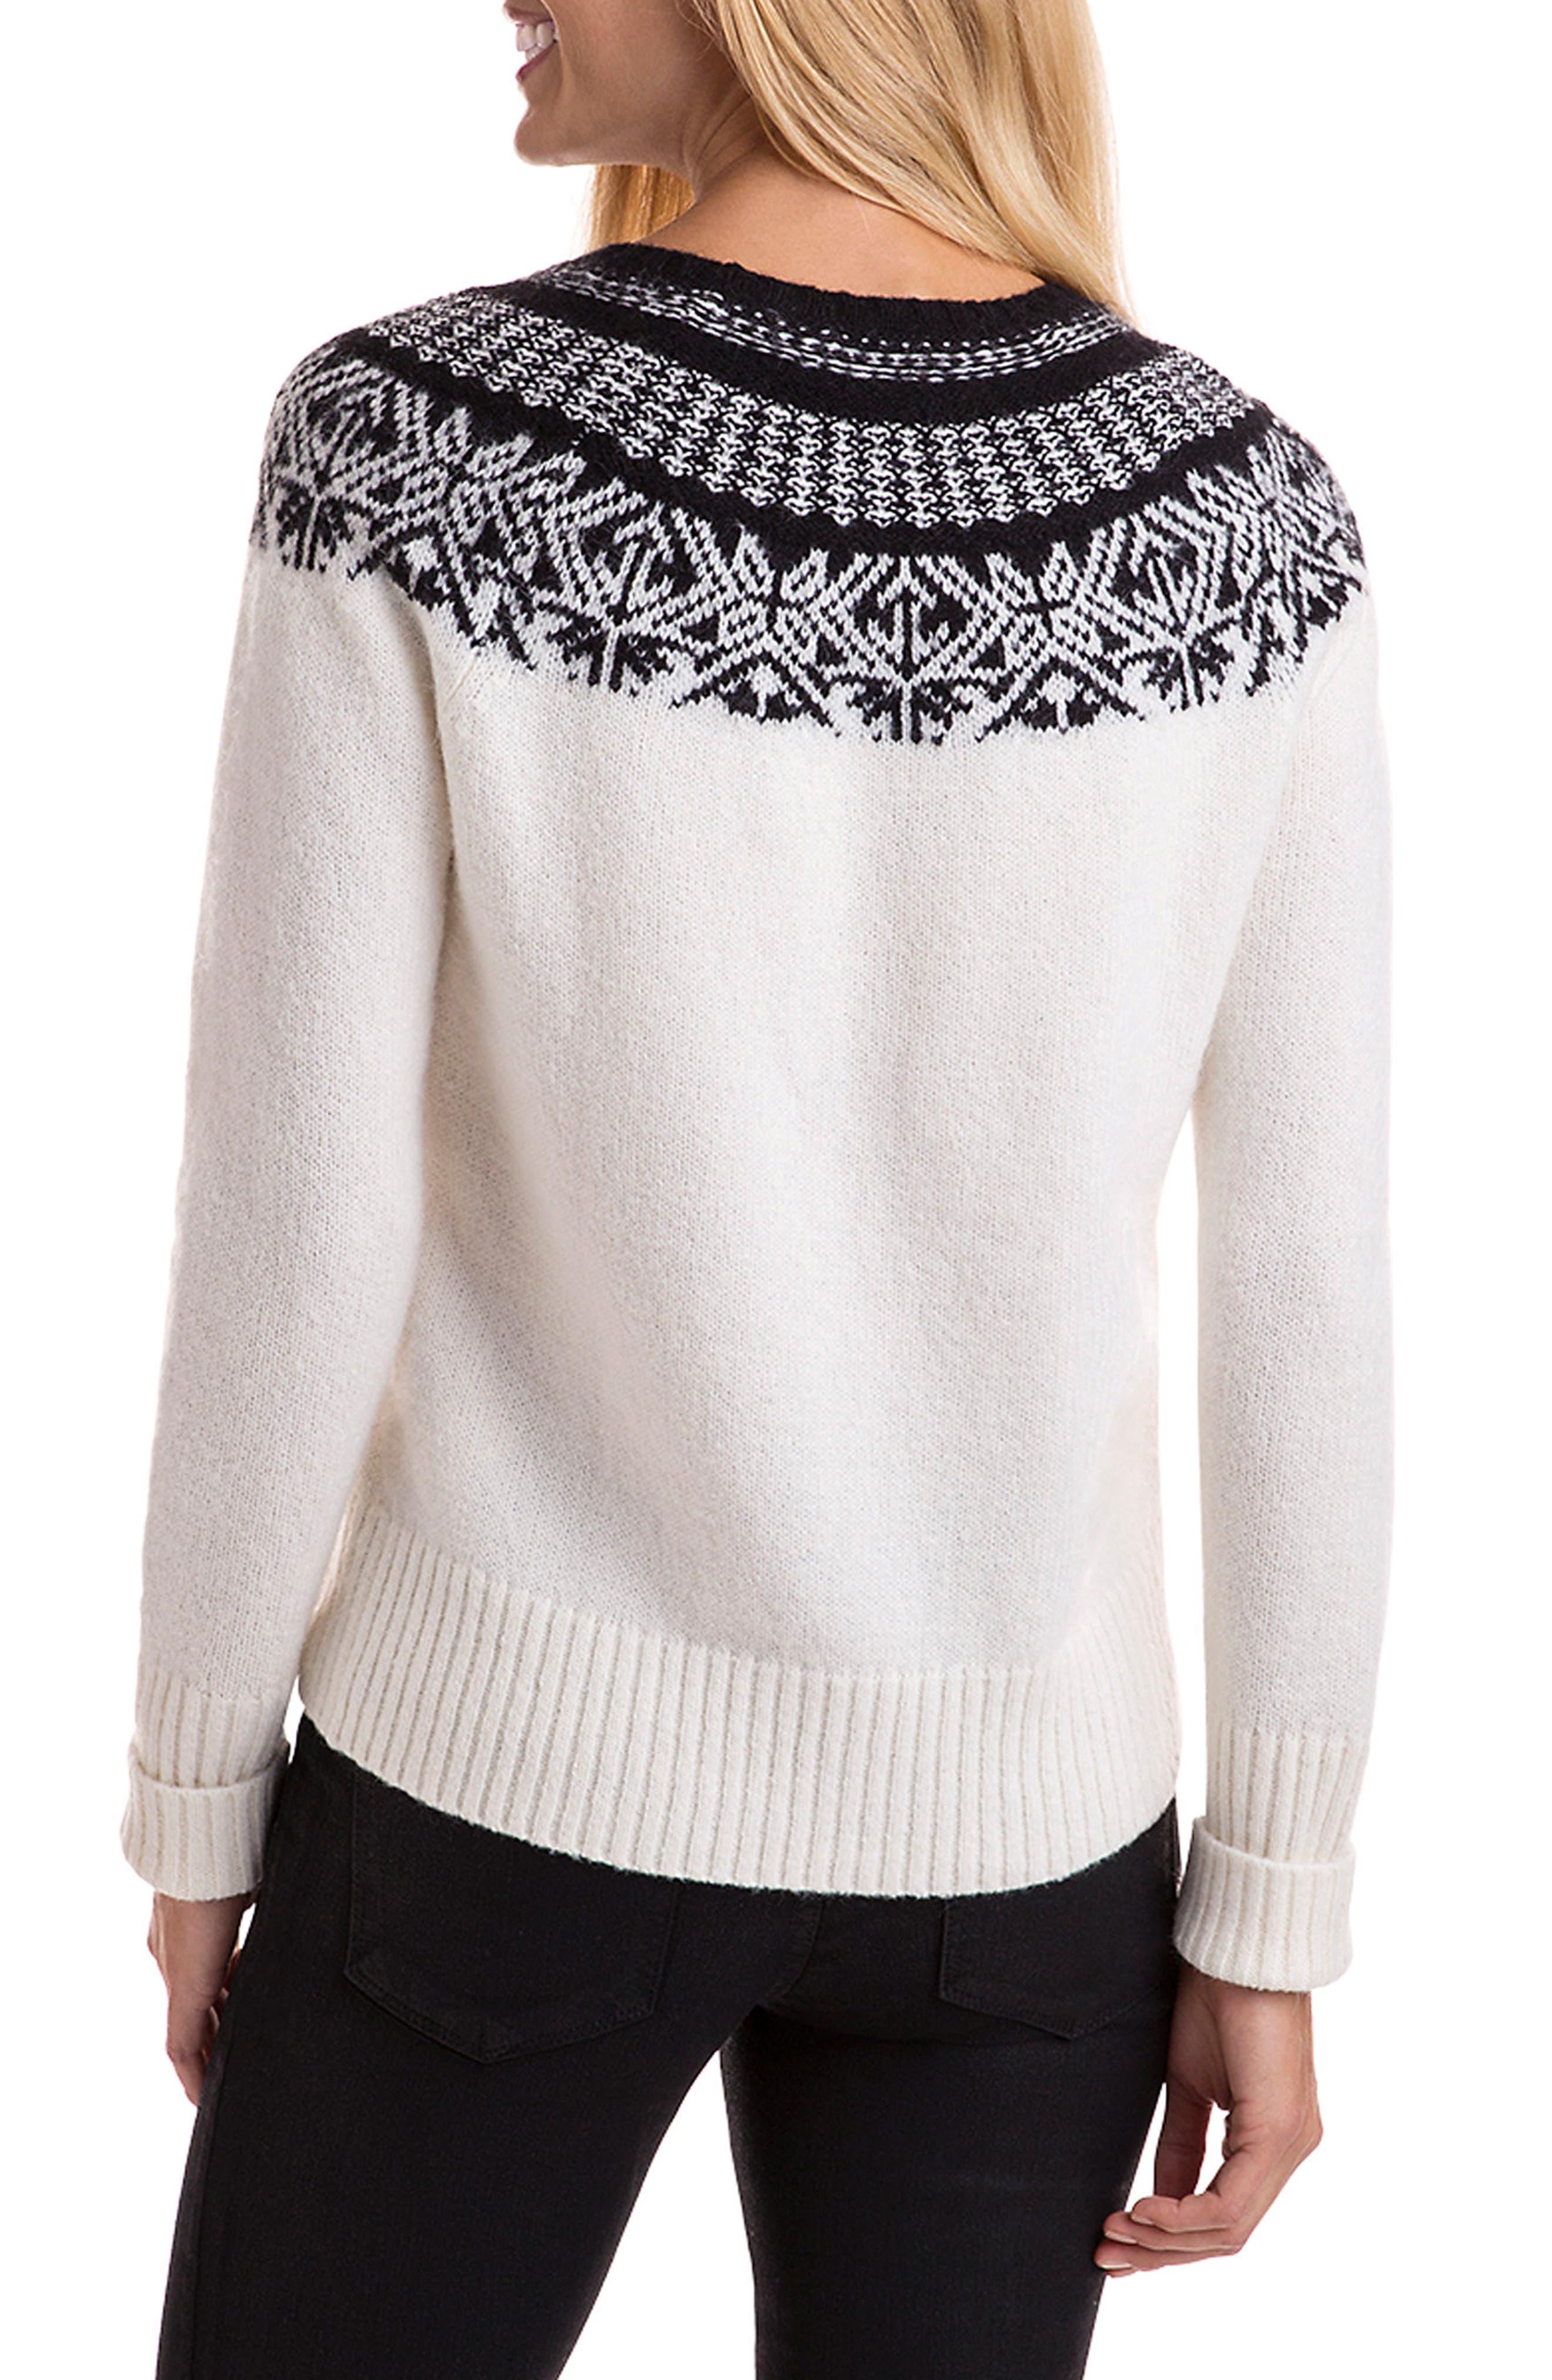 Nordic Fair Isle Sweater,                             Alternate thumbnail 2, color,                             900